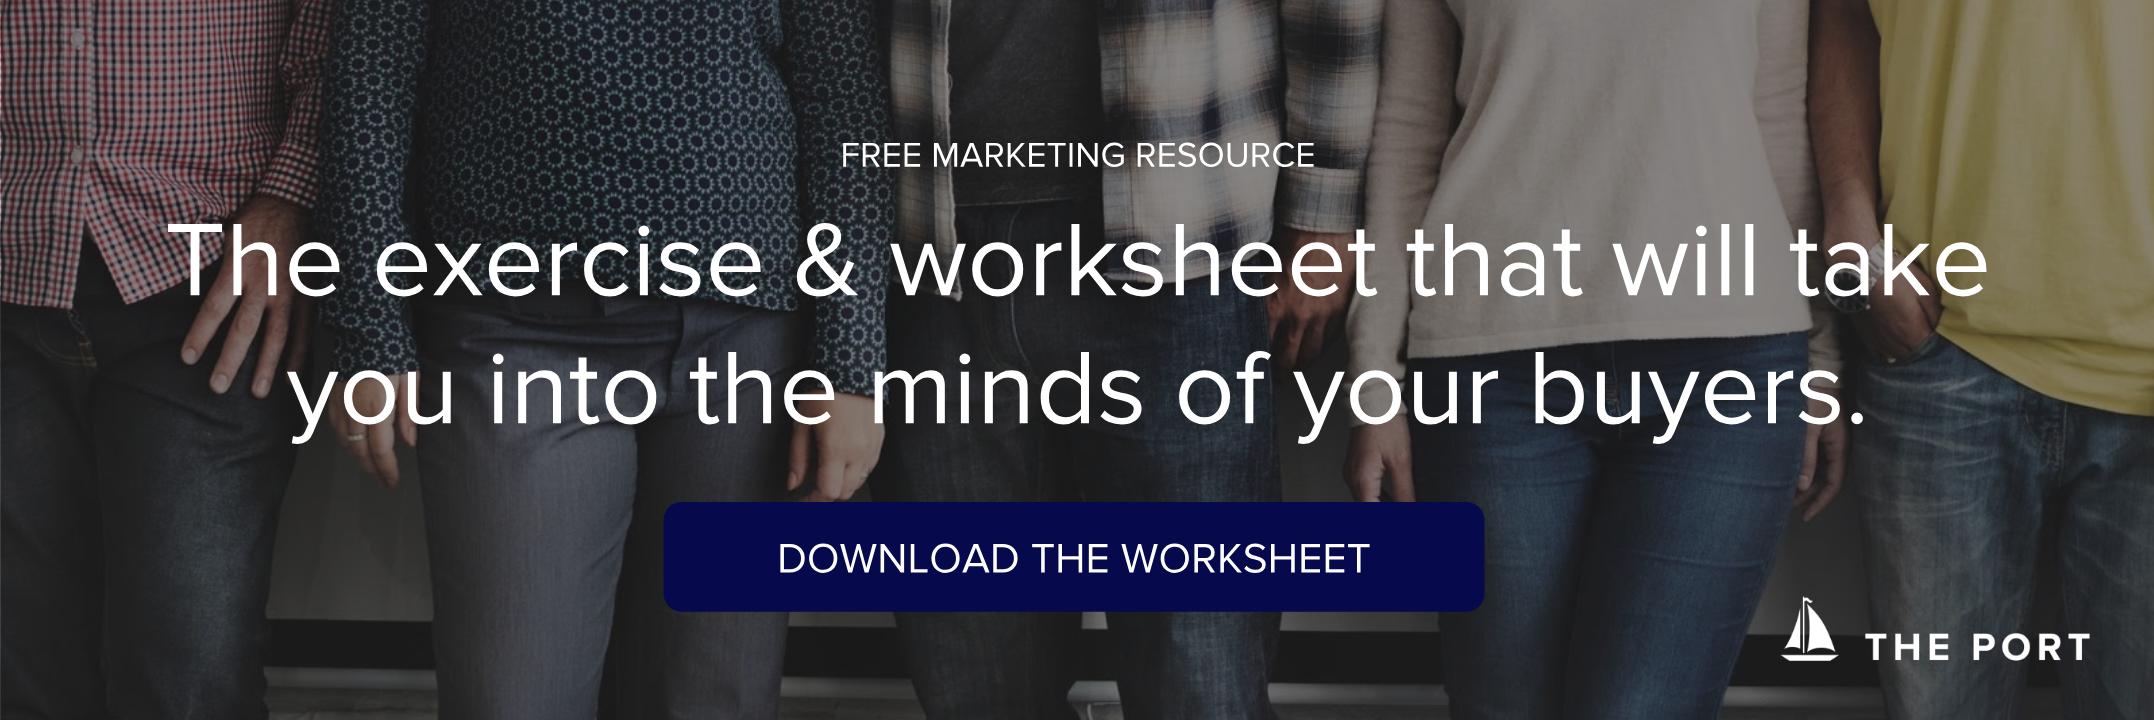 marketing-buyer-persona-template-download-worksheet.png